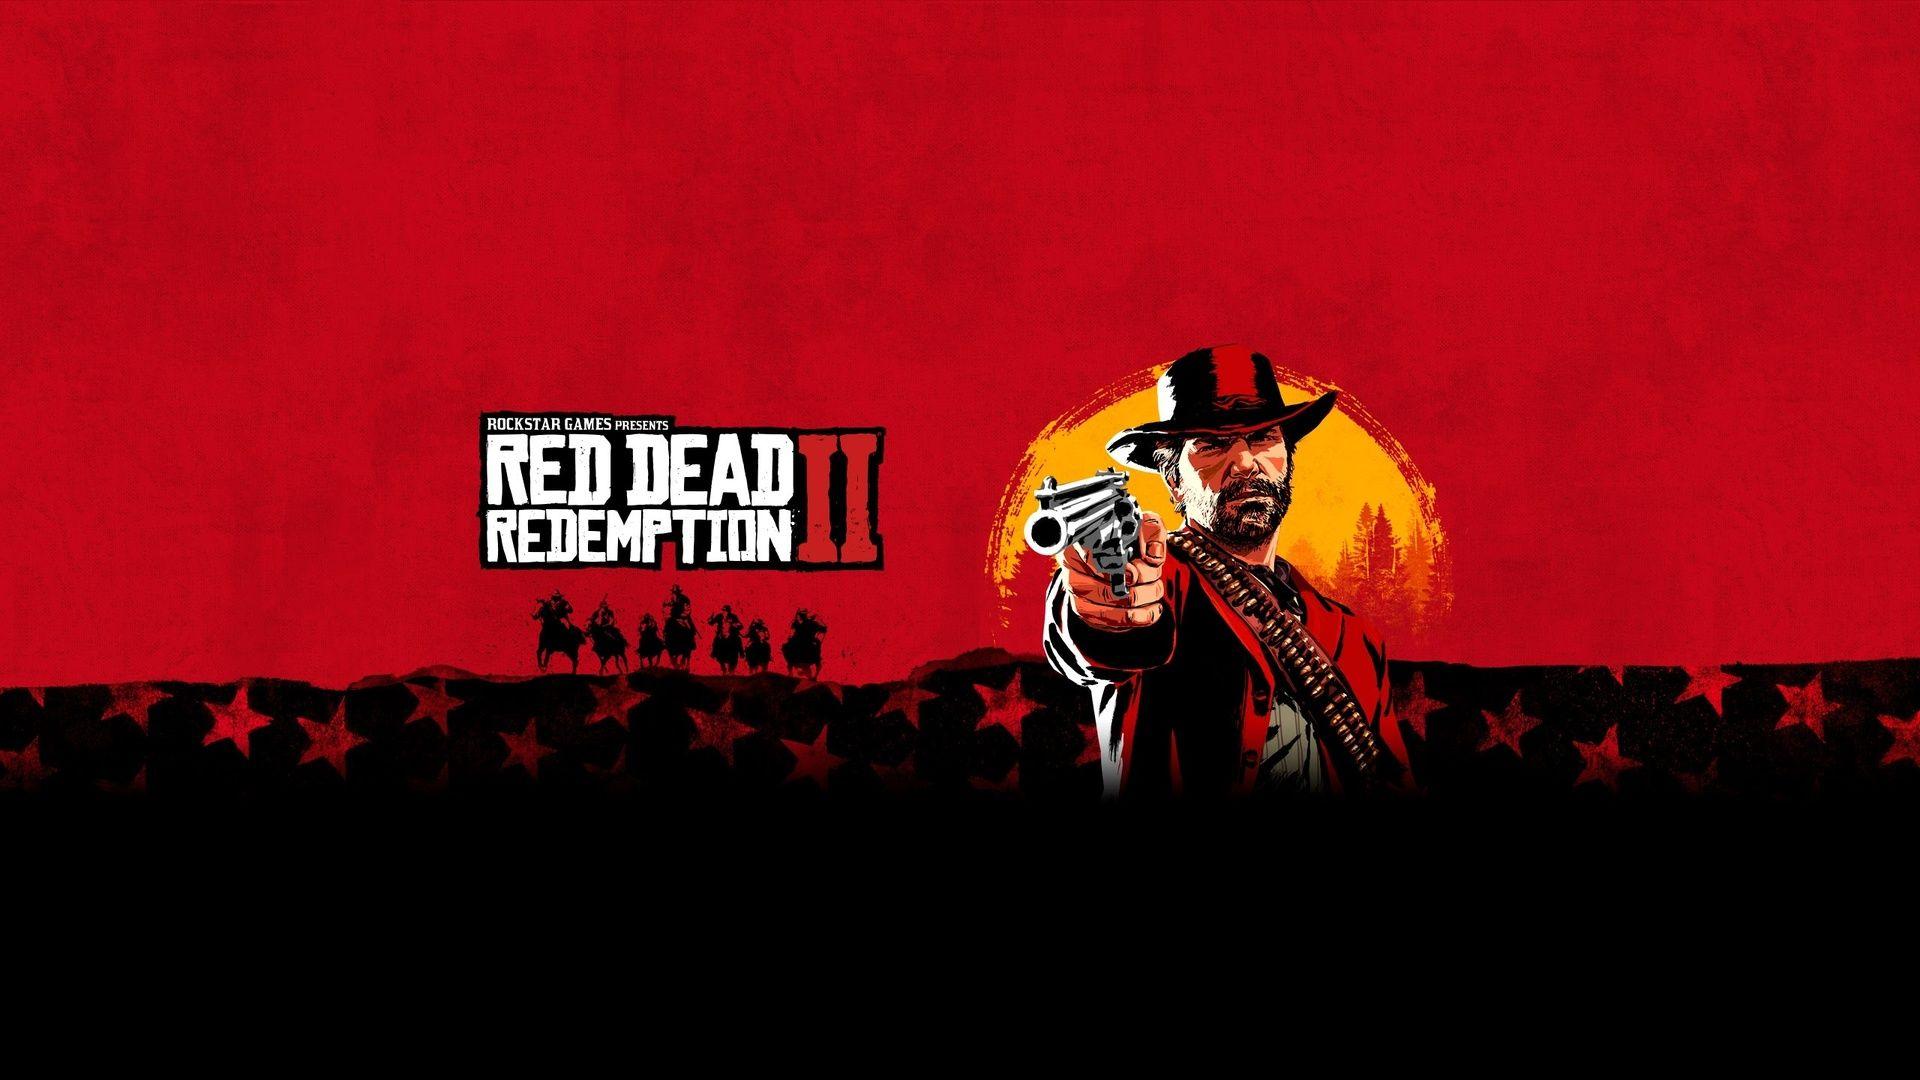 Red Dead Redemption 2 Rockstar Wallpapers Hd Resolution Red Dead Redemption Fear Of The Dark Red Dead Redemption Ii